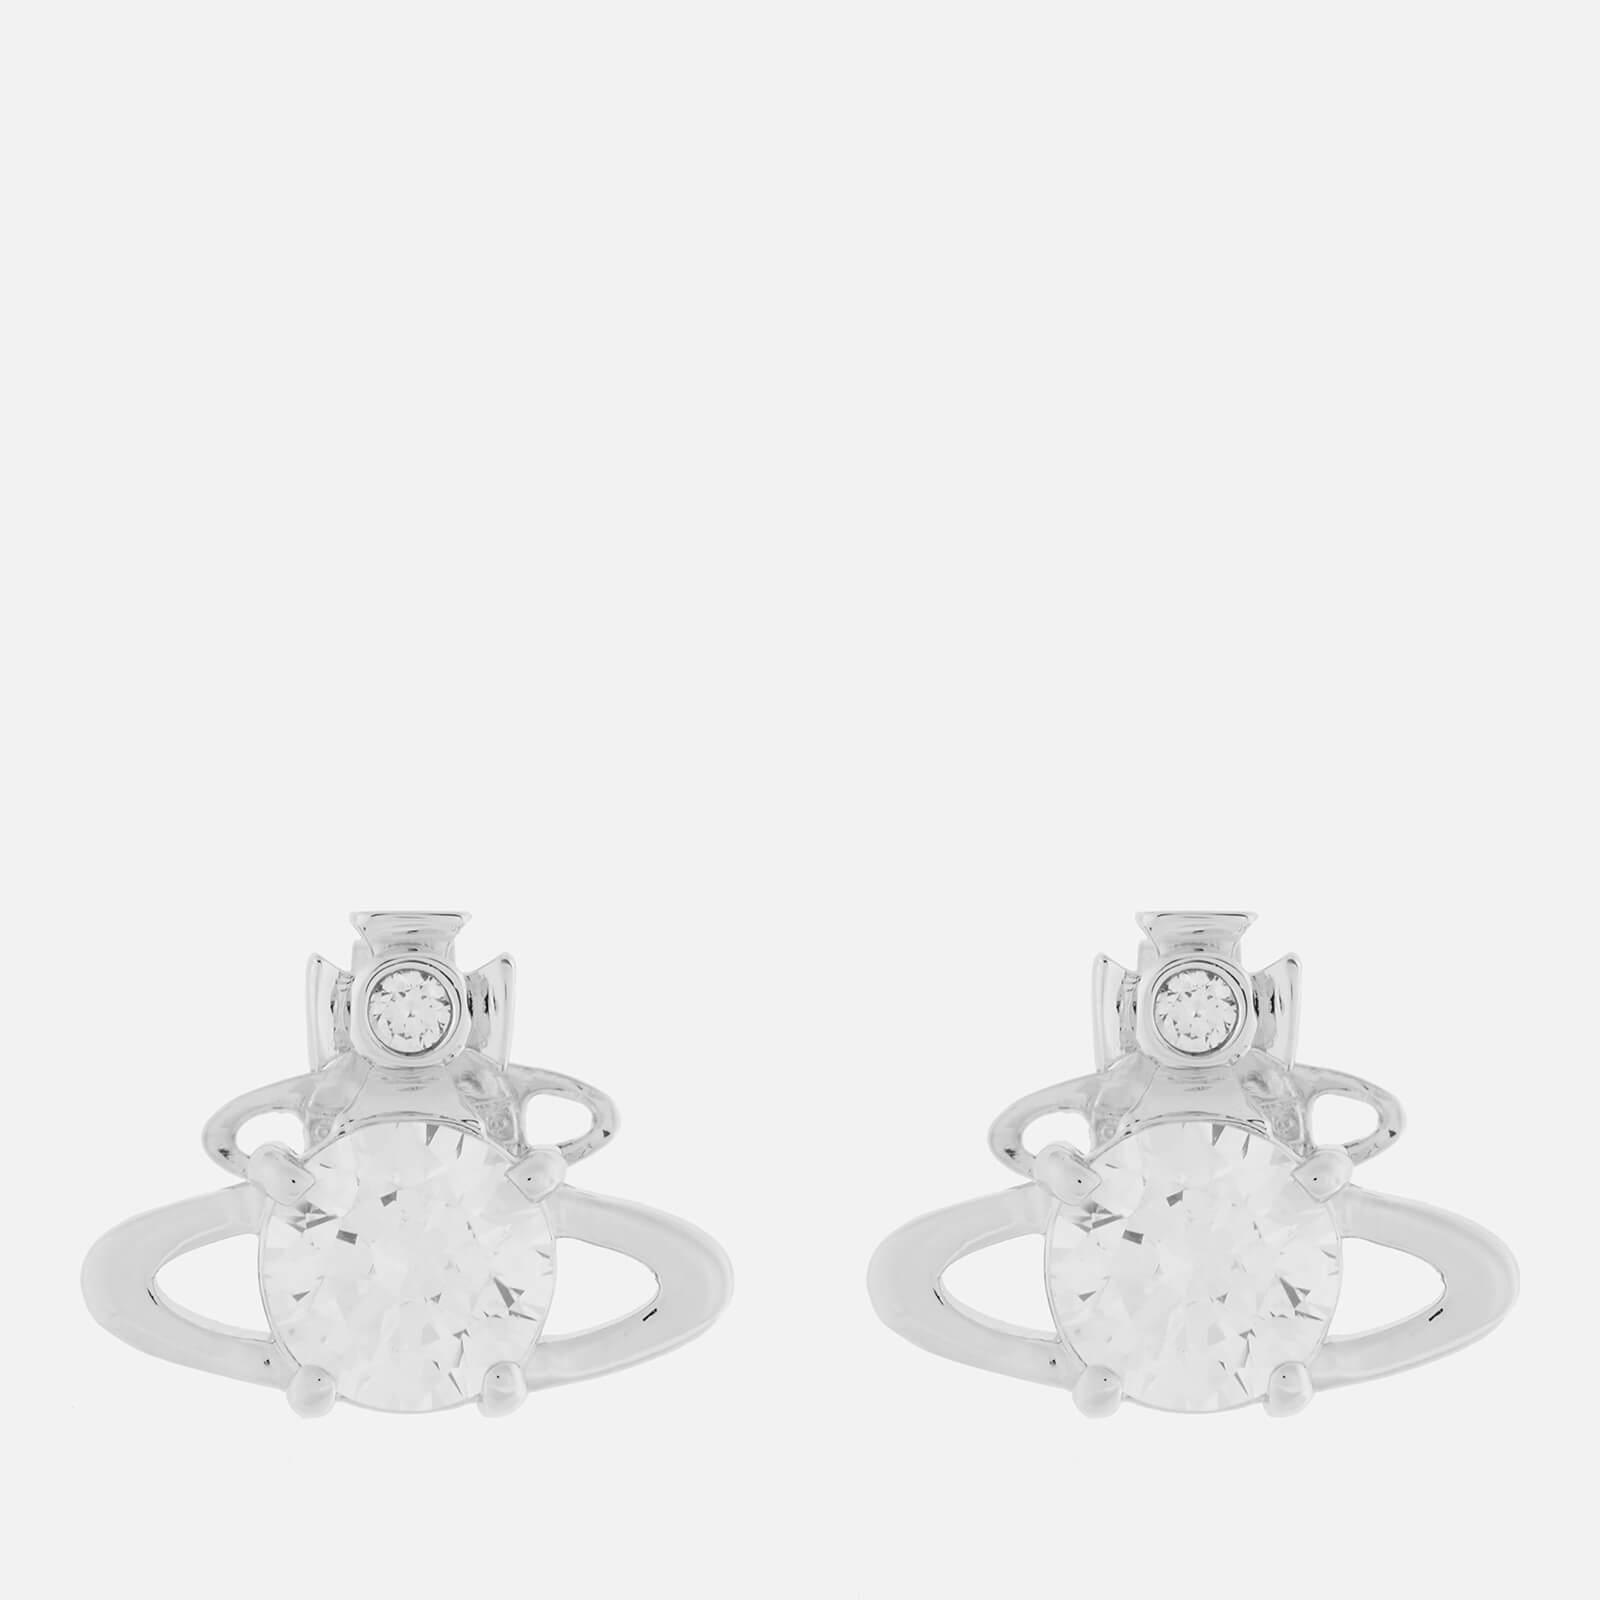 Vivienne Westwood Women's Reina Earrings - Rhodium White CZ